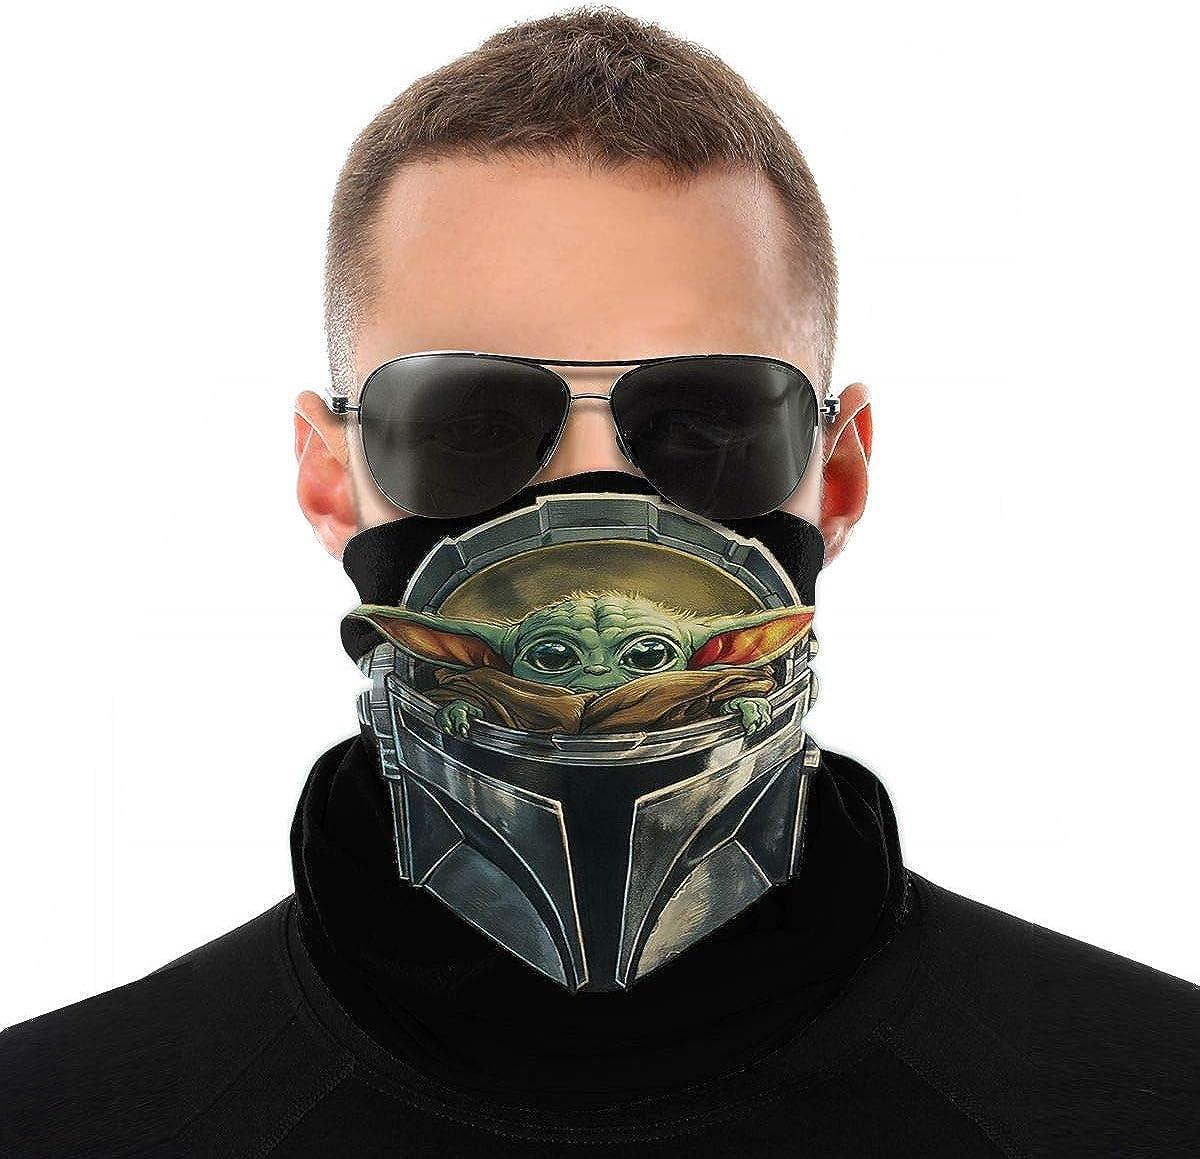 Derberha Baby Yoda Classic Direct stock discount Bandana Face Mask Balaclava Headwrap Max 50% OFF